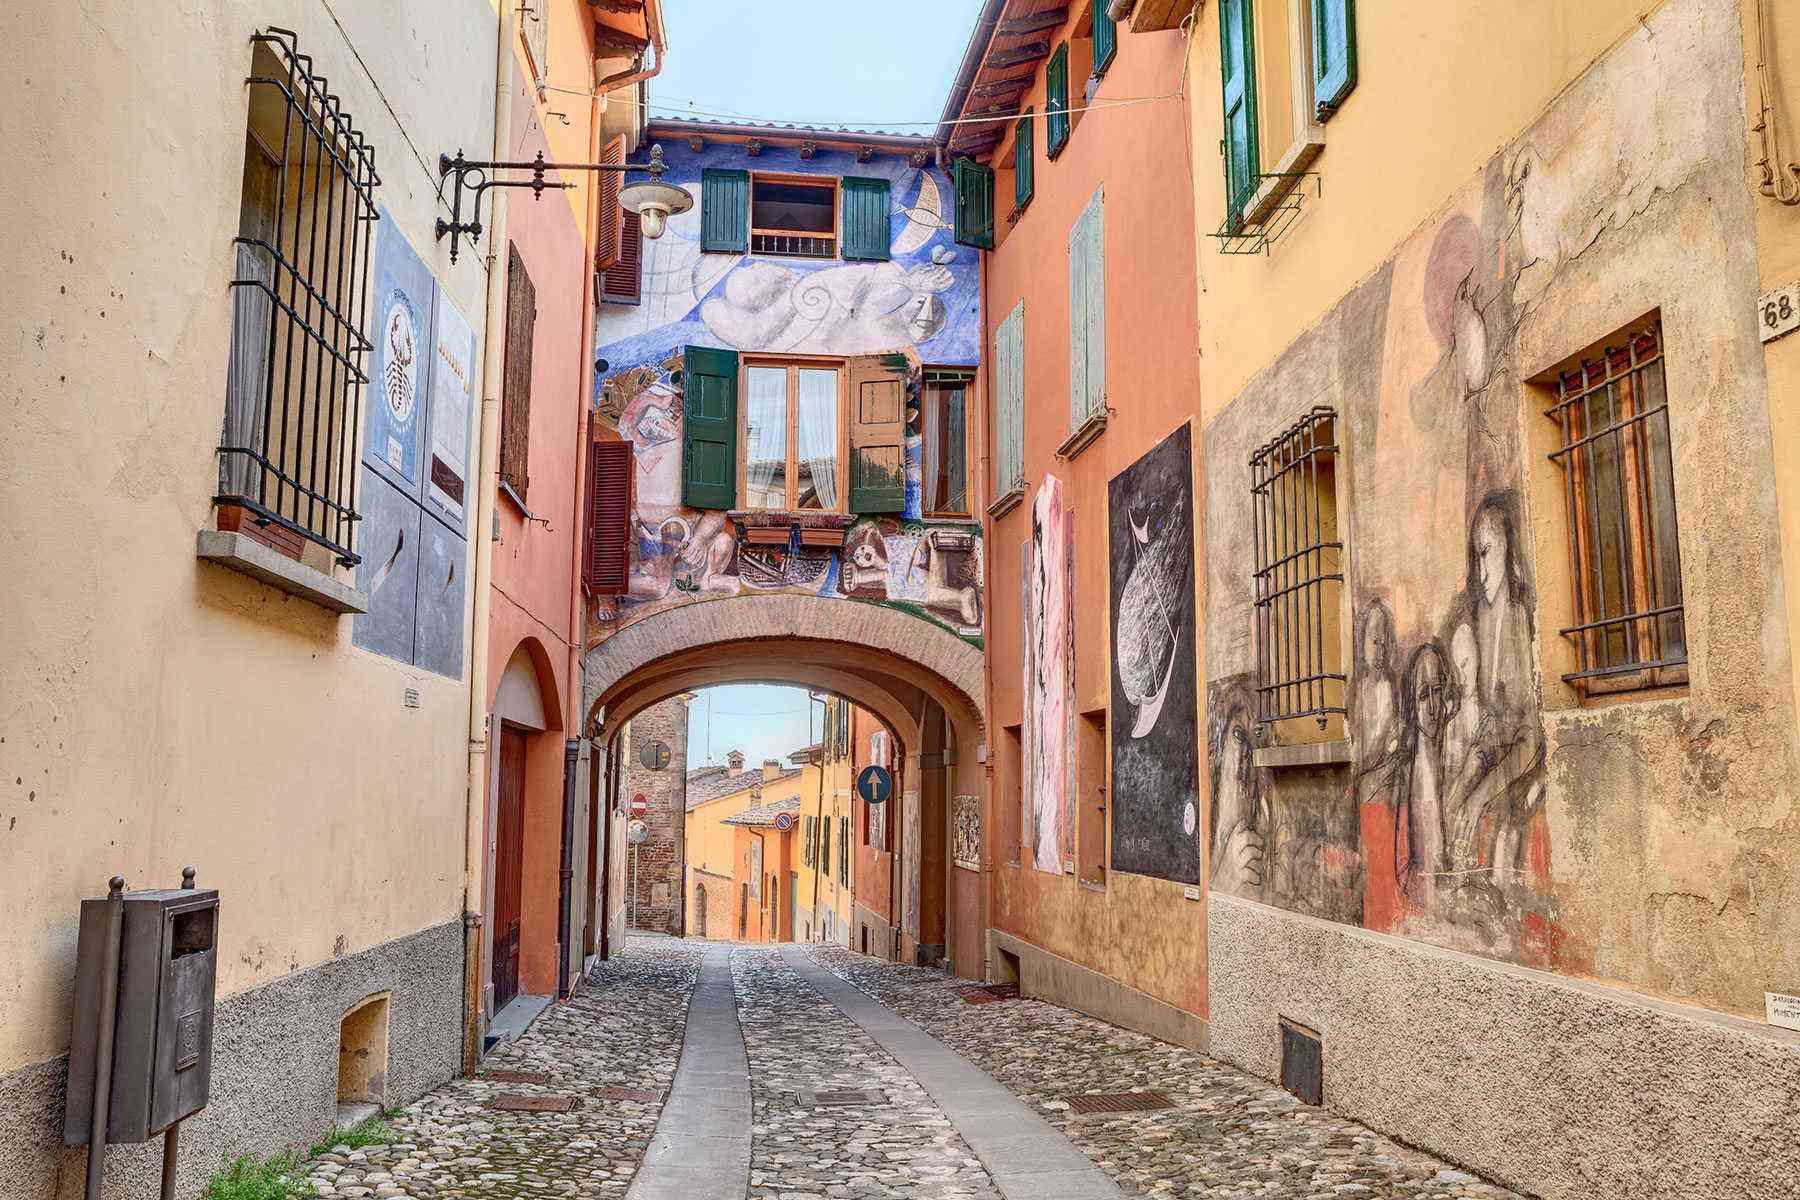 Medieval-Italian-Towns-Dozza-1